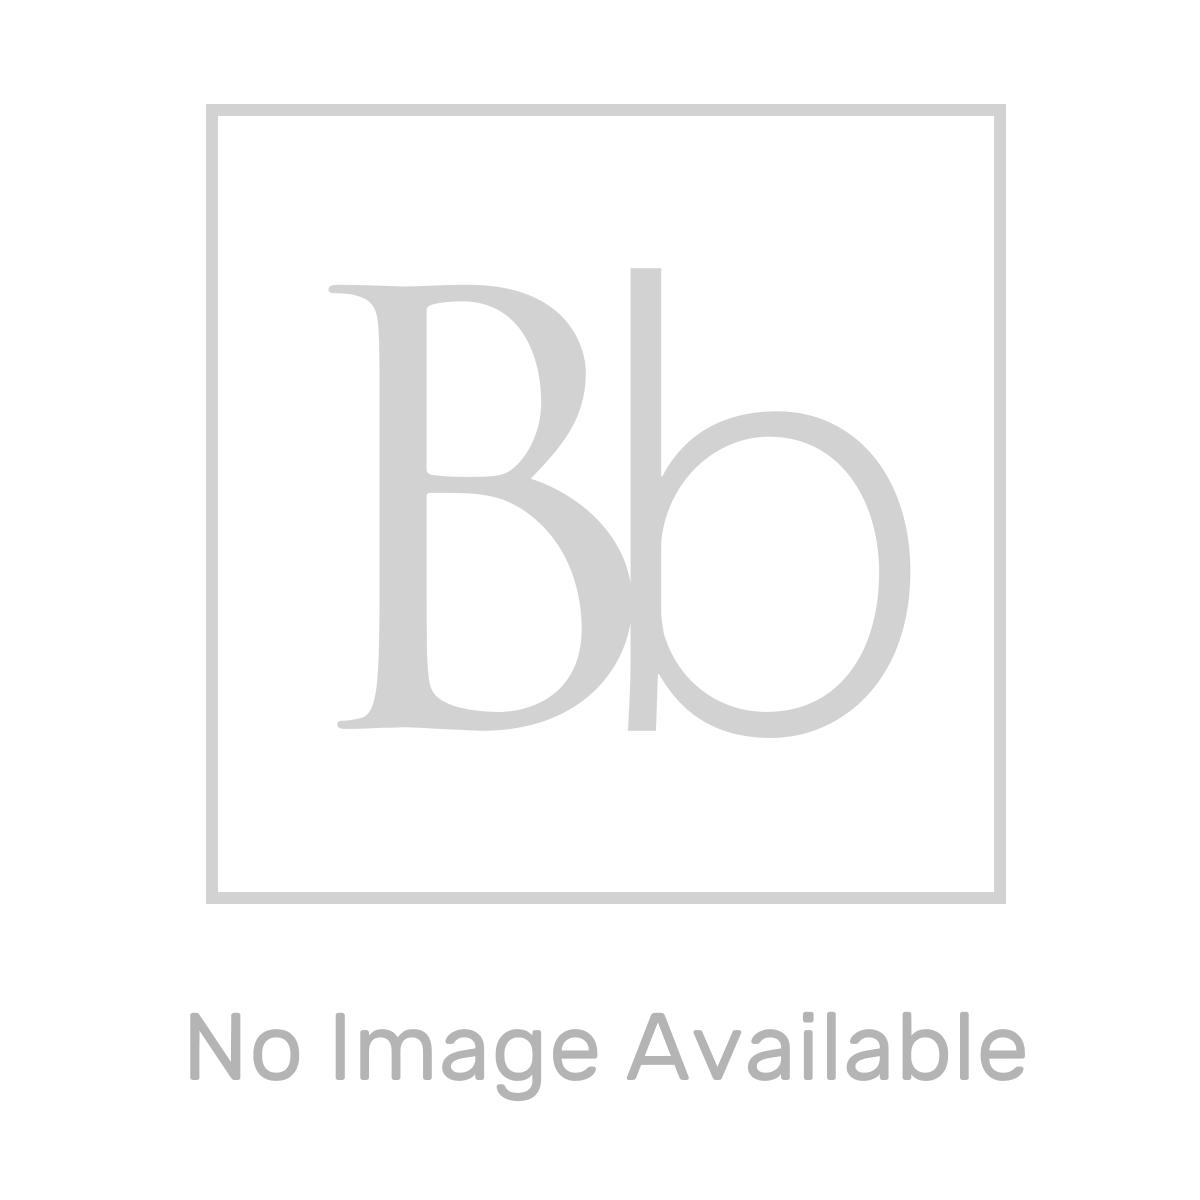 BTL Lucia Sea Green Round Mirror 550 x 550mm